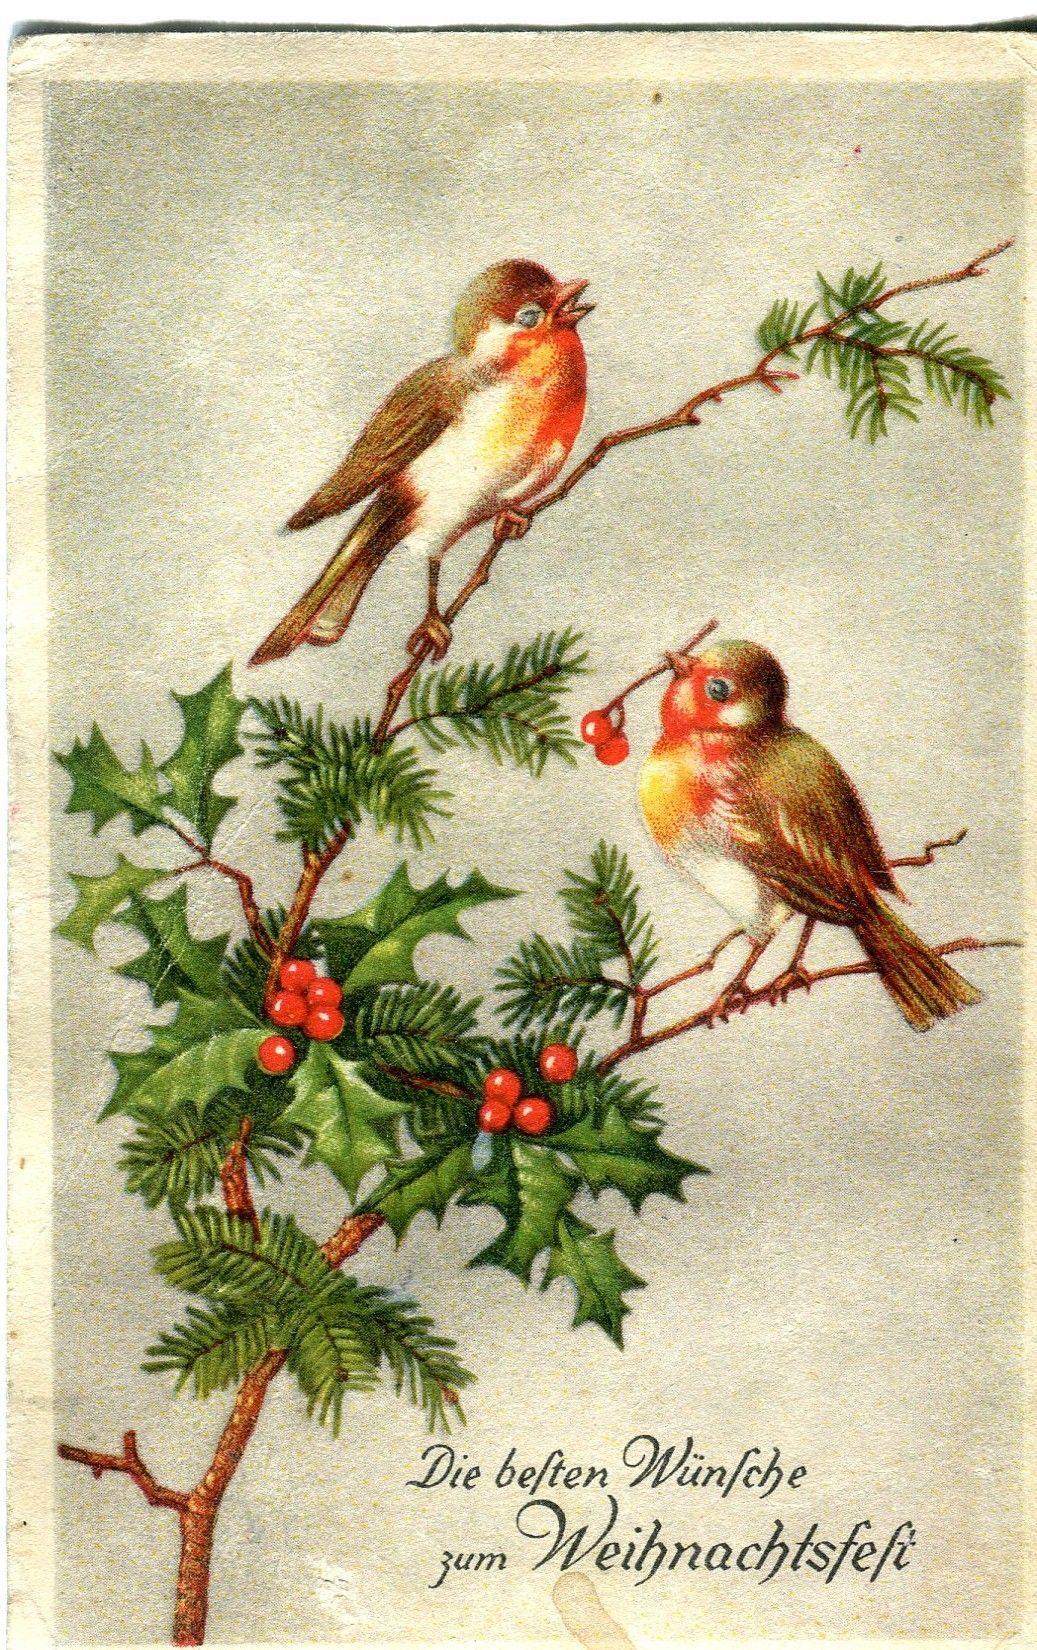 img066_23367784962_o #christmas #vintage #xmas #holiday #holidays #santa #snowmen #ads #retro #kids #cards #people #trees #angels #winter #candy #etiquettesnoelaimprimer img066_23367784962_o #christmas #vintage #xmas #holiday #holidays #santa #snowmen #ads #retro #kids #cards #people #trees #angels #winter #candy #etiquettesnoelaimprimer